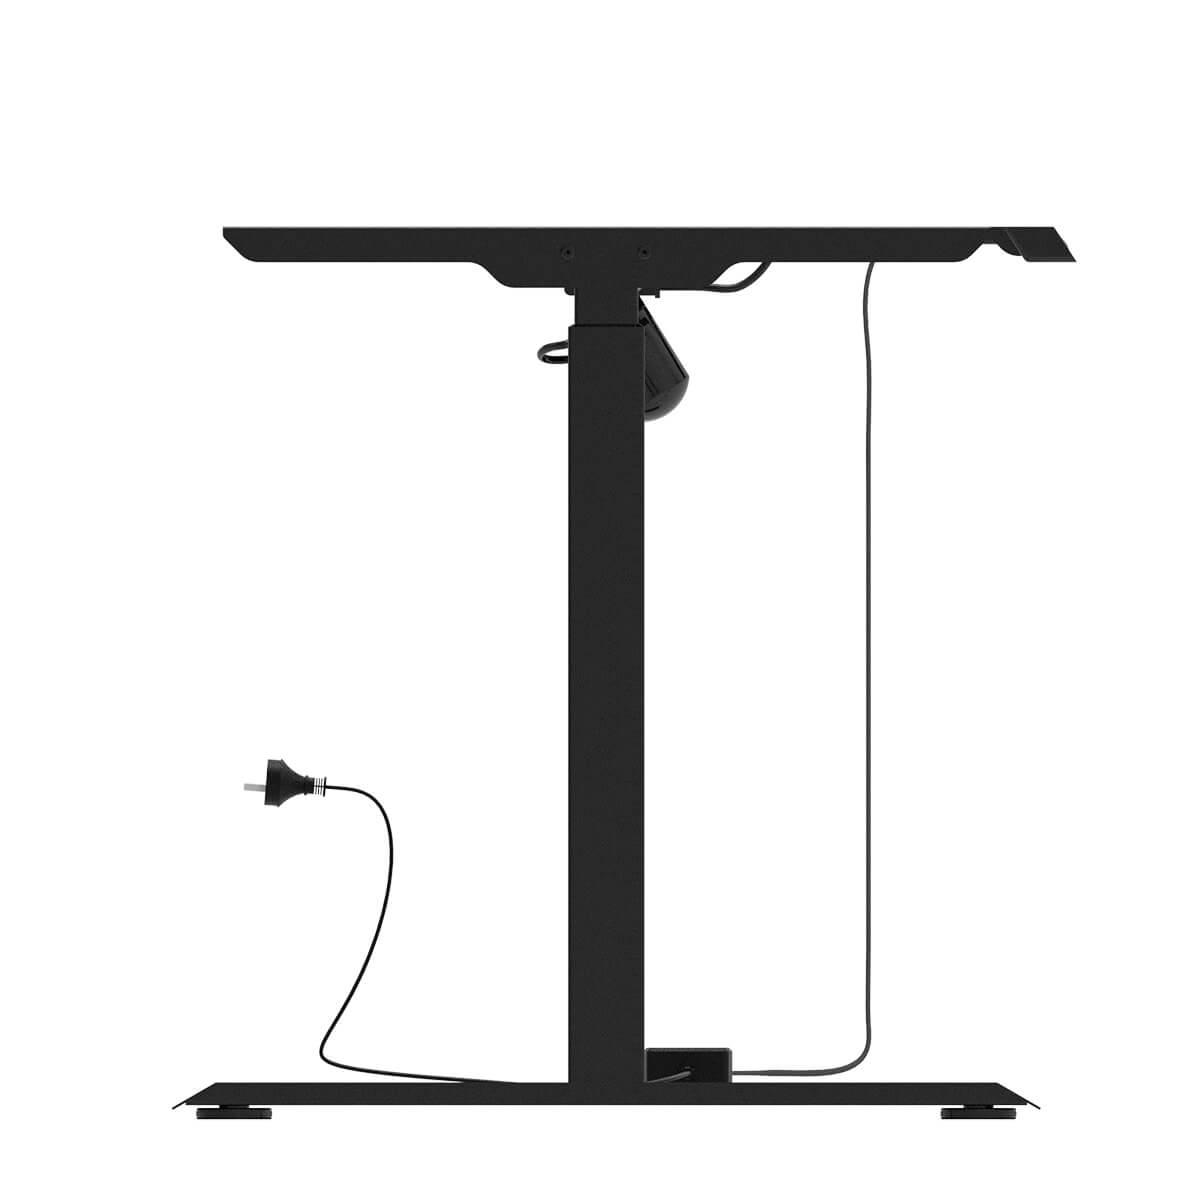 Основа за електрическо бюро, Parma black